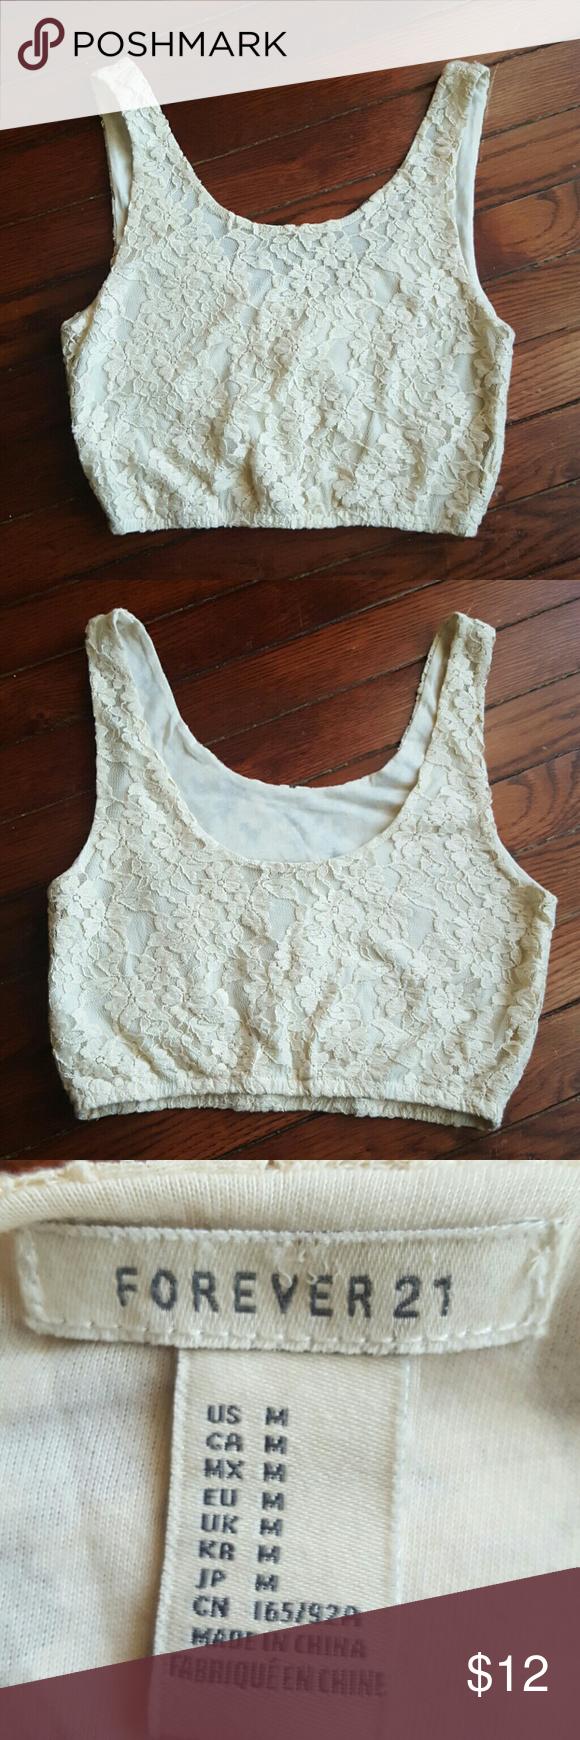 0342a749cda8ad Cream Floral Lace Crochet Knit Crop Top Tank Floral lace and crochet knit crop  top tank